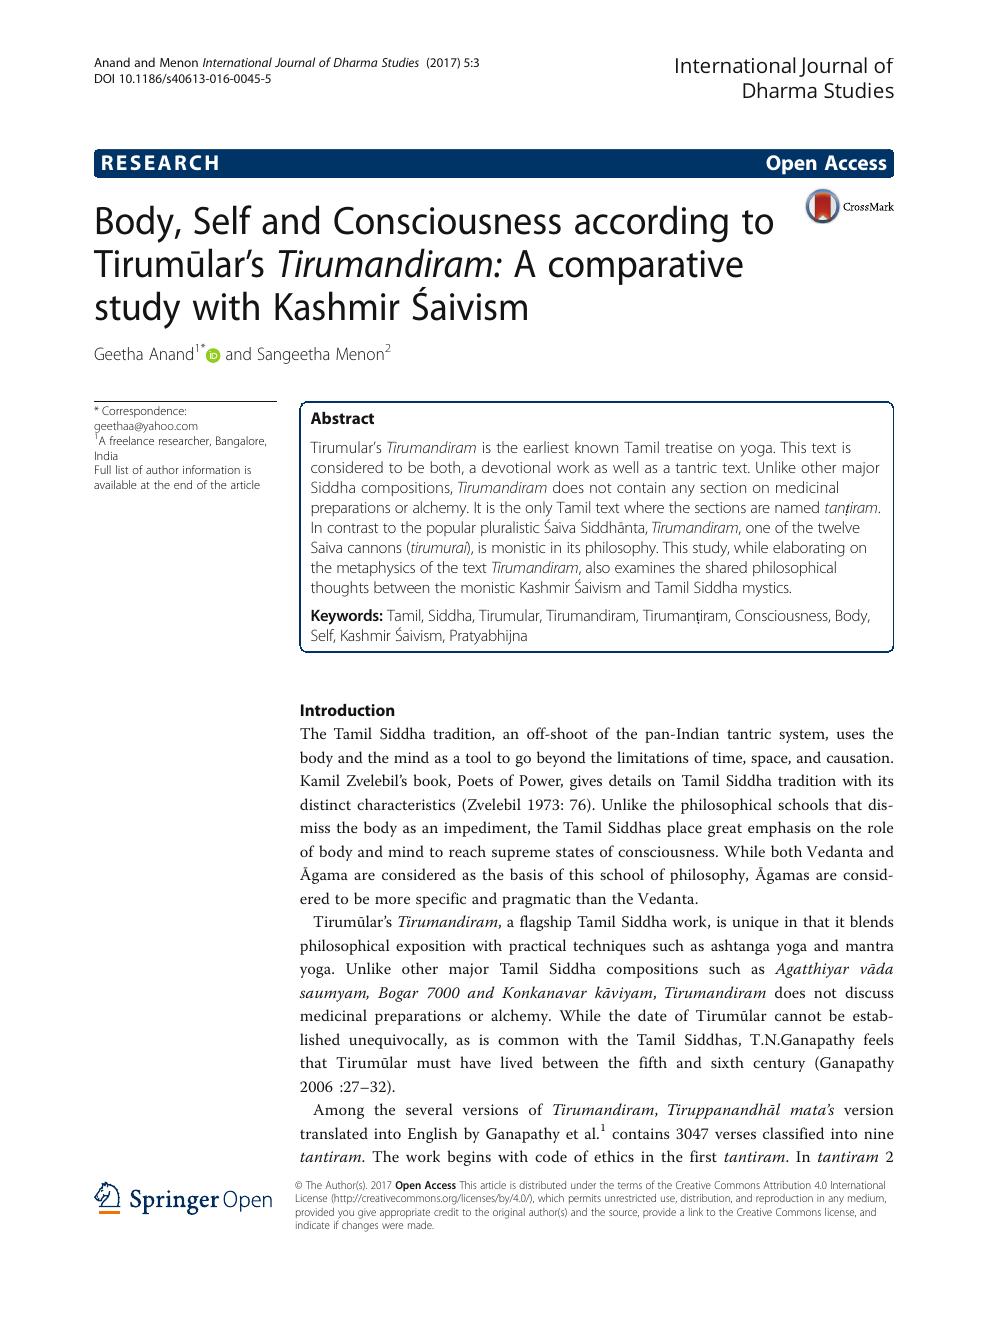 Body, Self and Consciousness according to Tirumūlar's